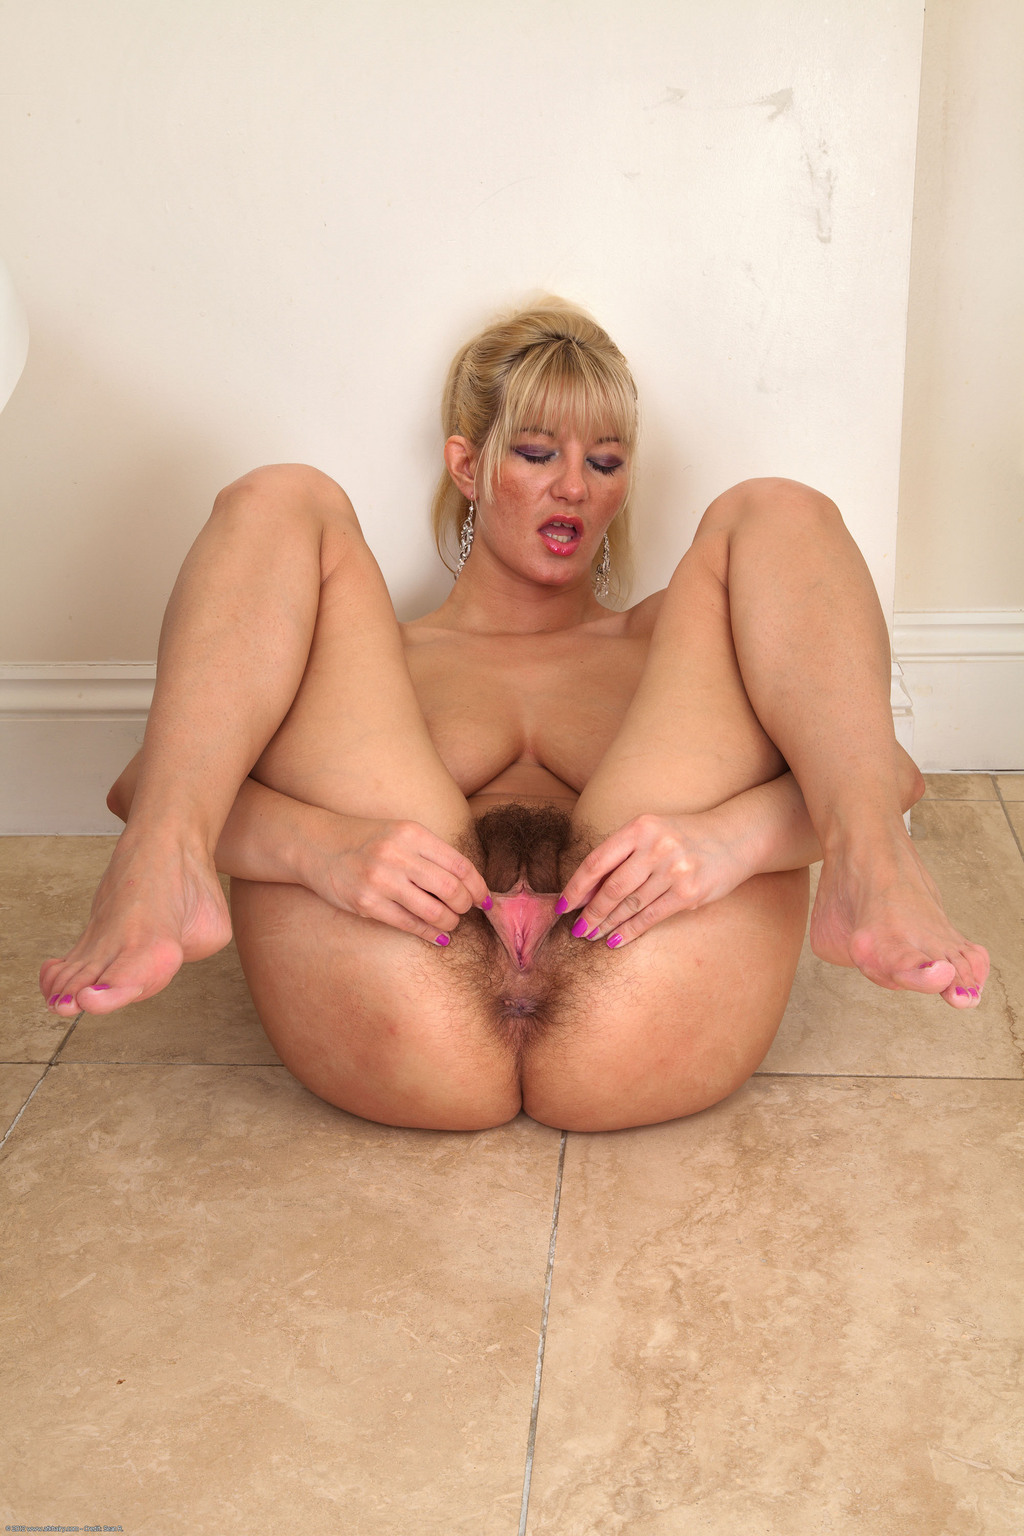 hot nude vegas babe tits